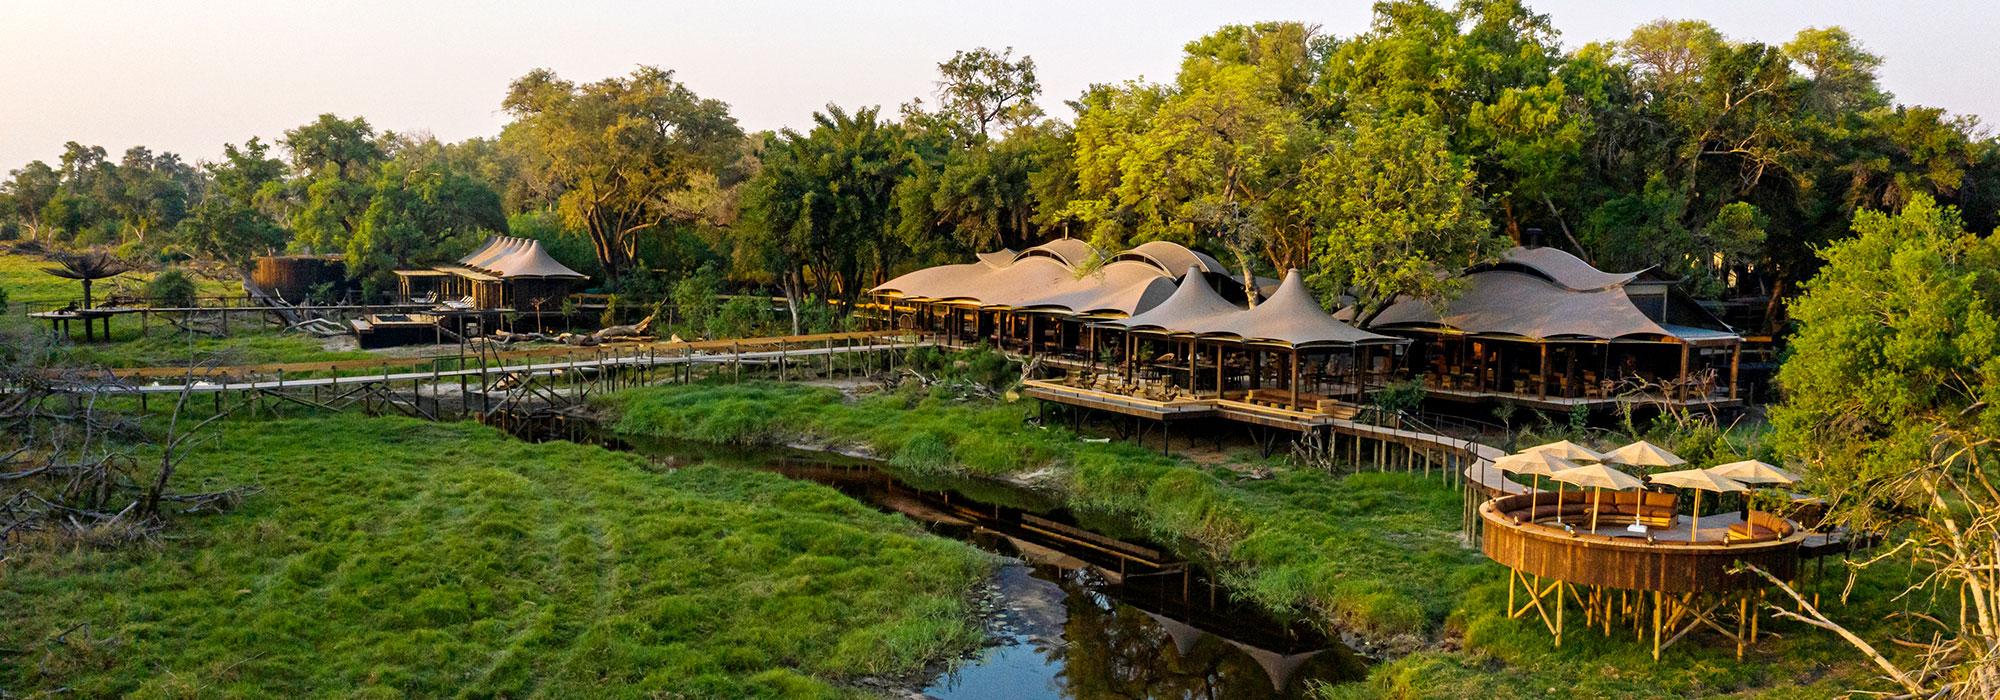 Xigera Safari Lodge from Above